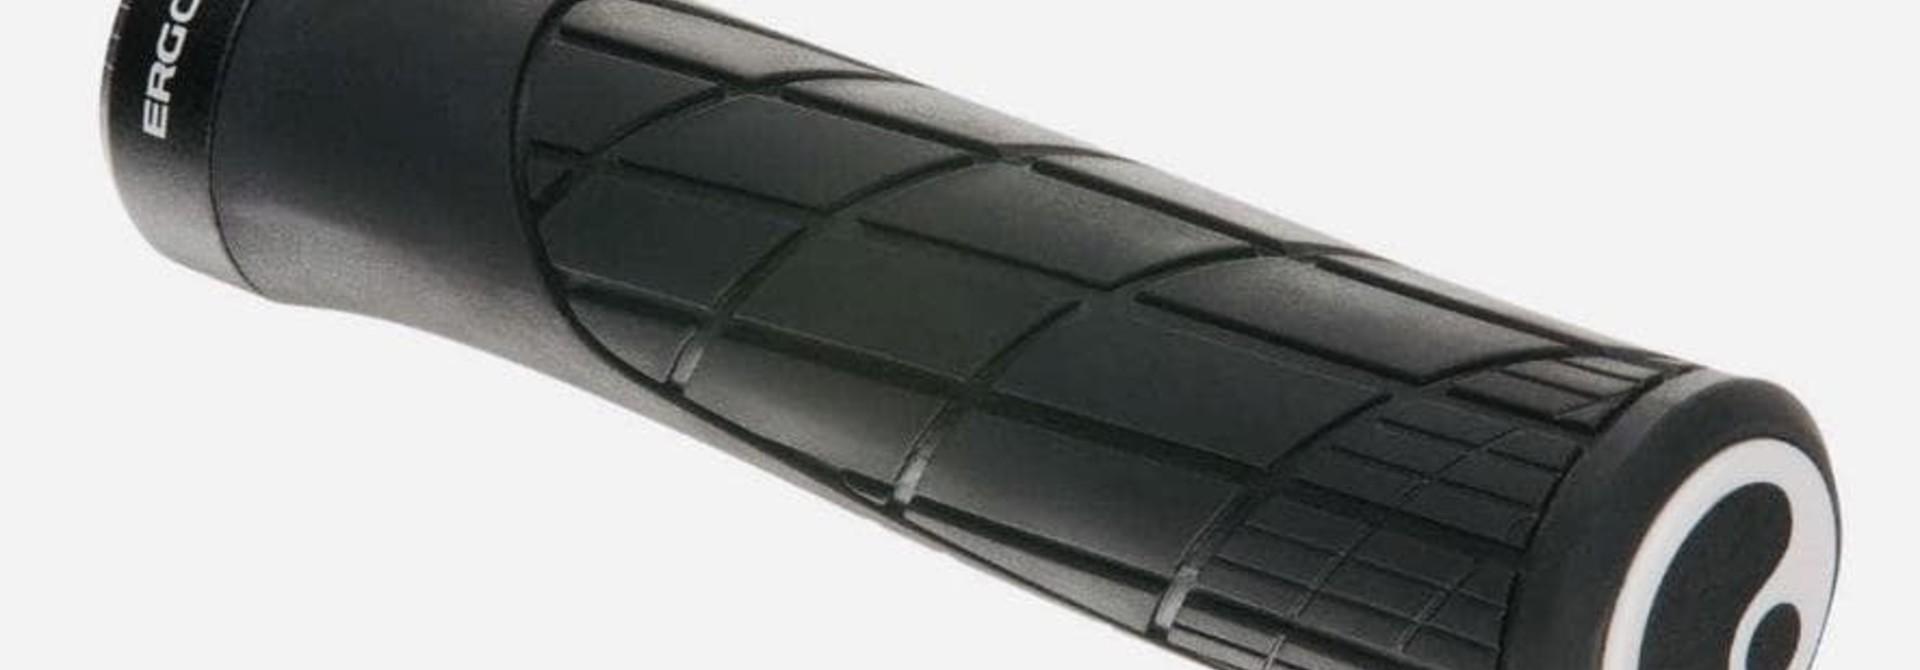 Ergon GA2 Grips - Black, Lock-On